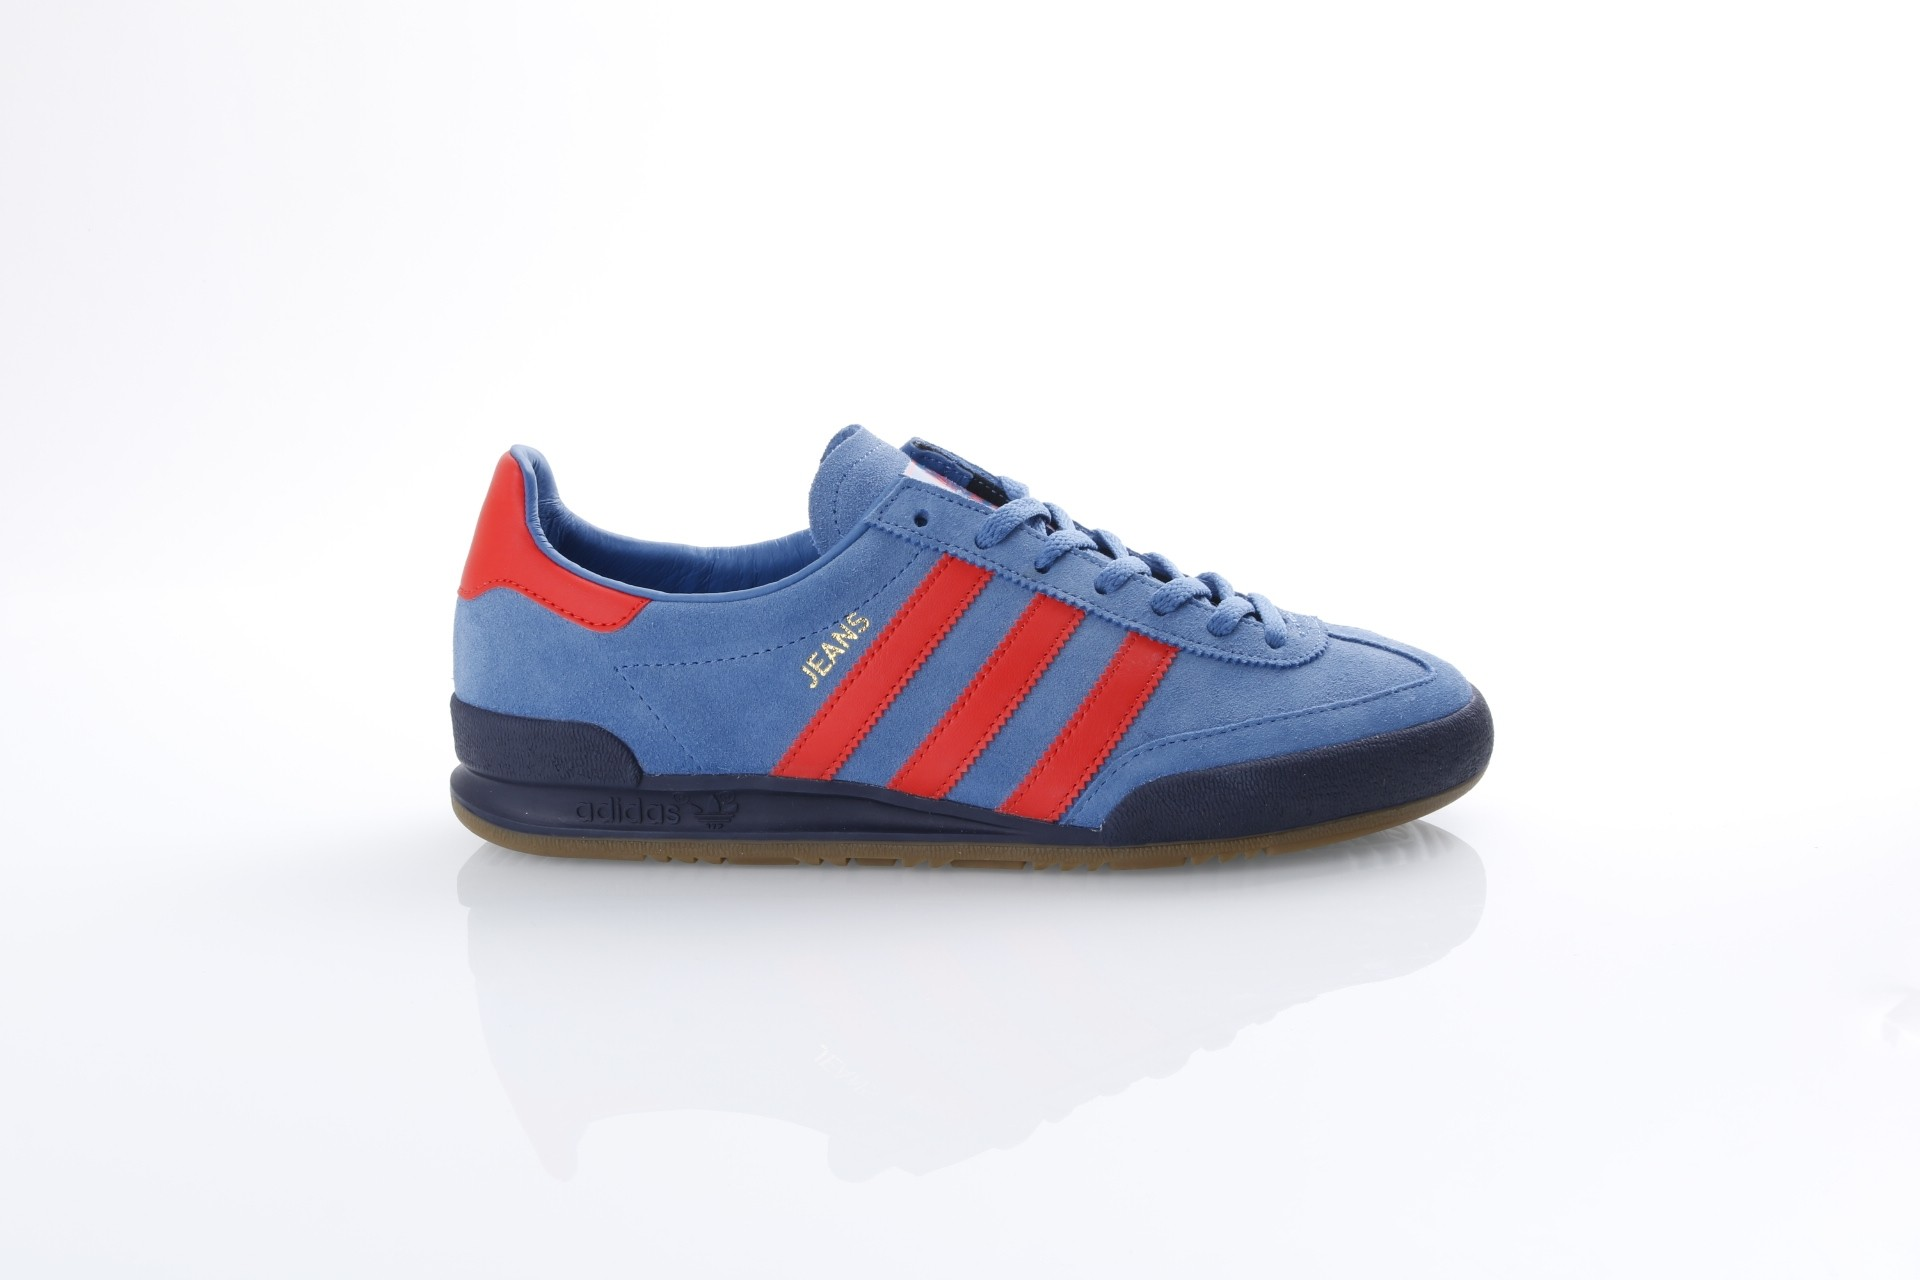 Foto van Adidas Originals CQ2766 Sneakers Jeans Blauw